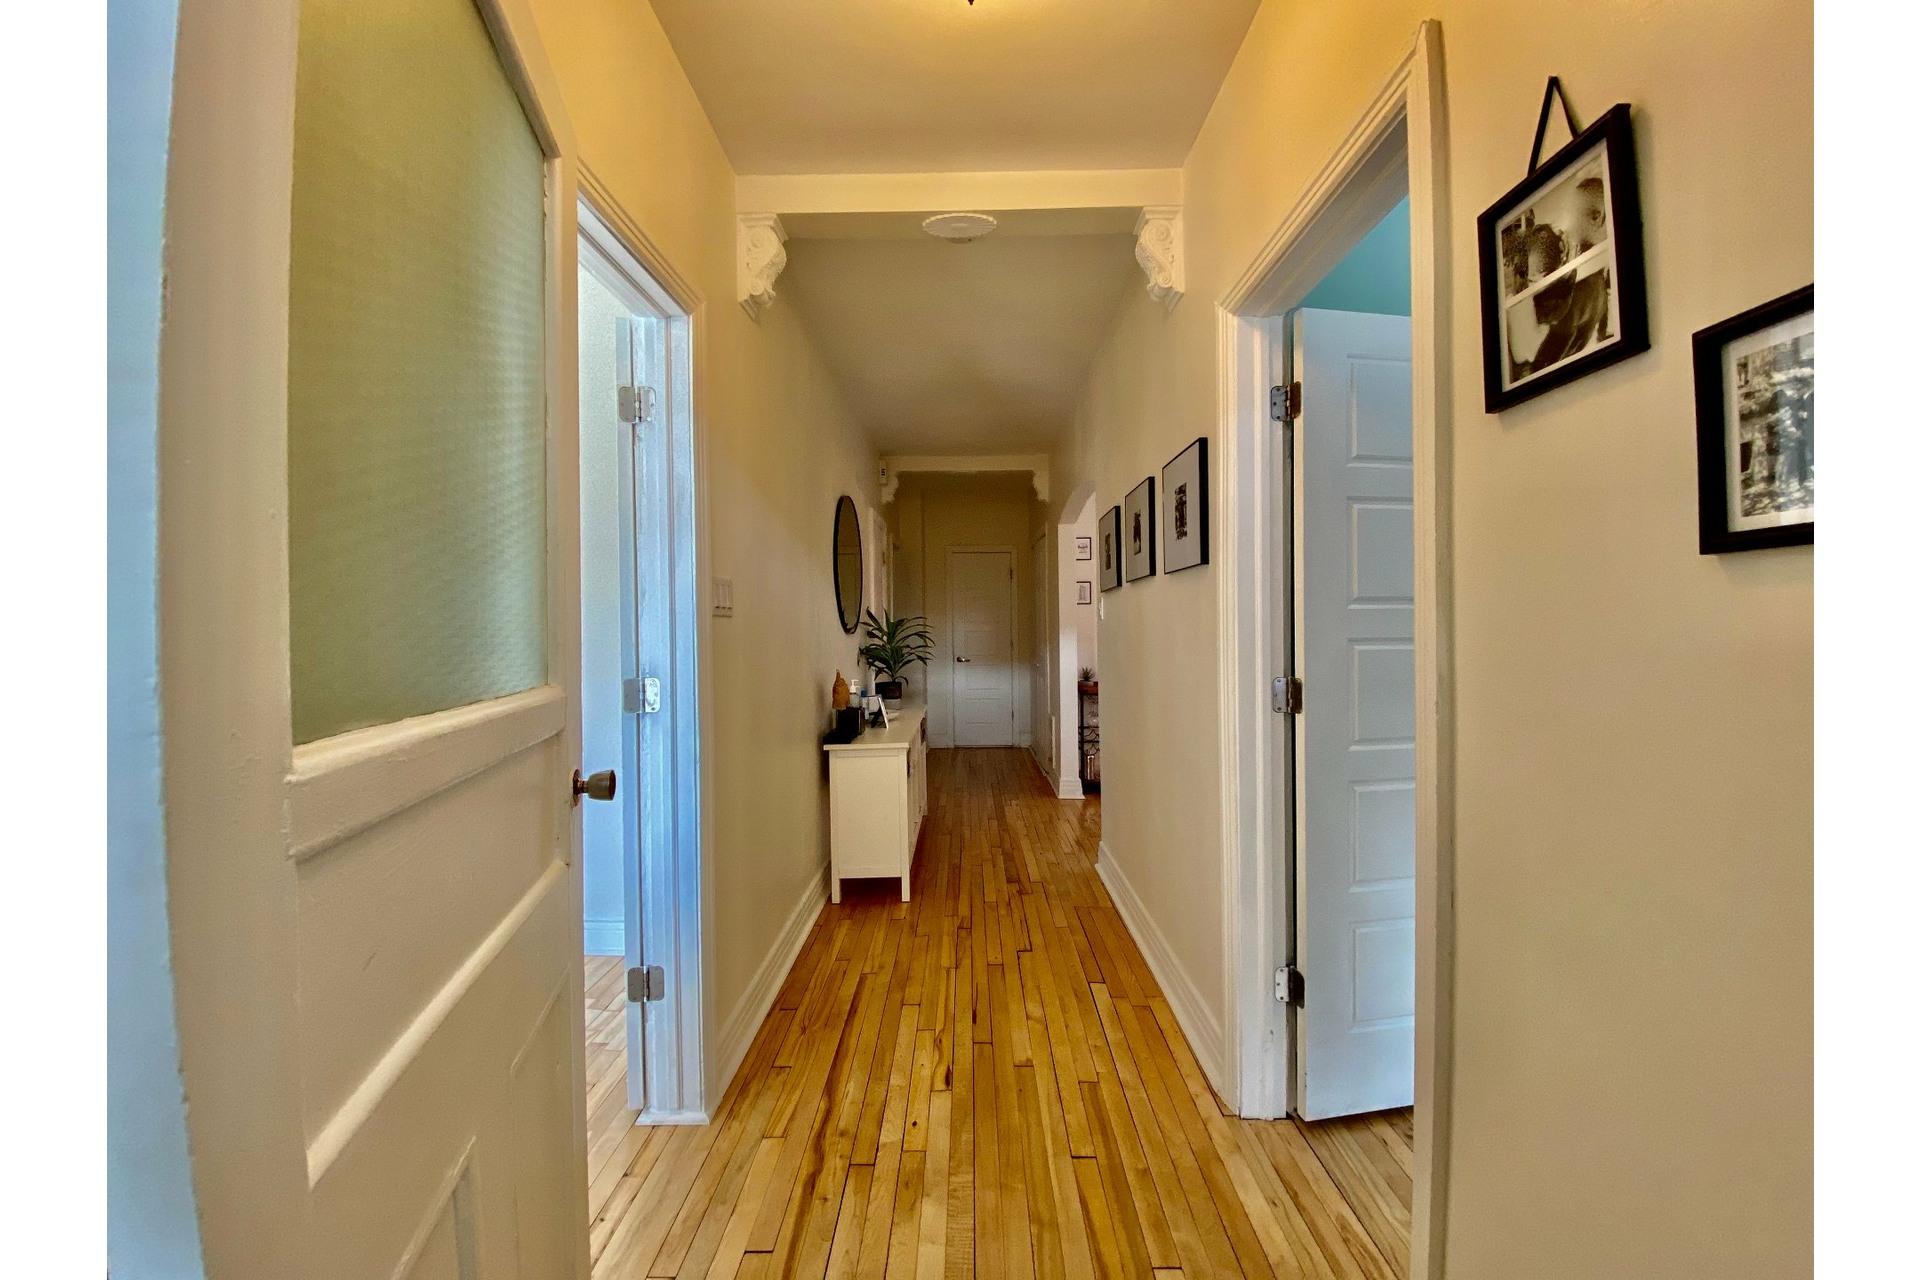 image 20 - Duplex En venta Lachine Montréal  - 6 habitaciones